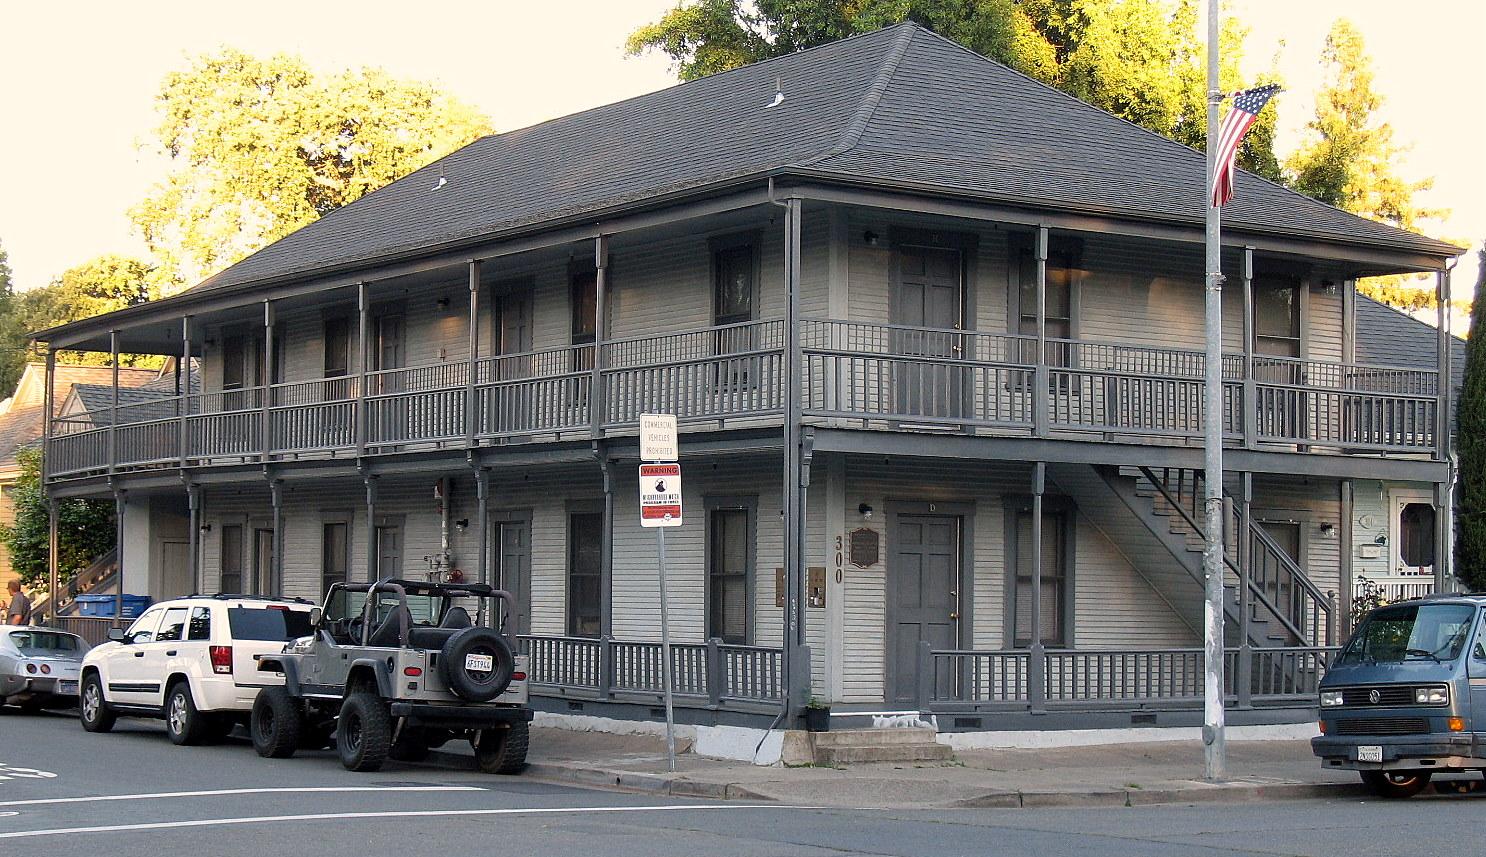 File:Park Apartments, 300 Santa Rosa Ave., Santa Rosa, CA ...